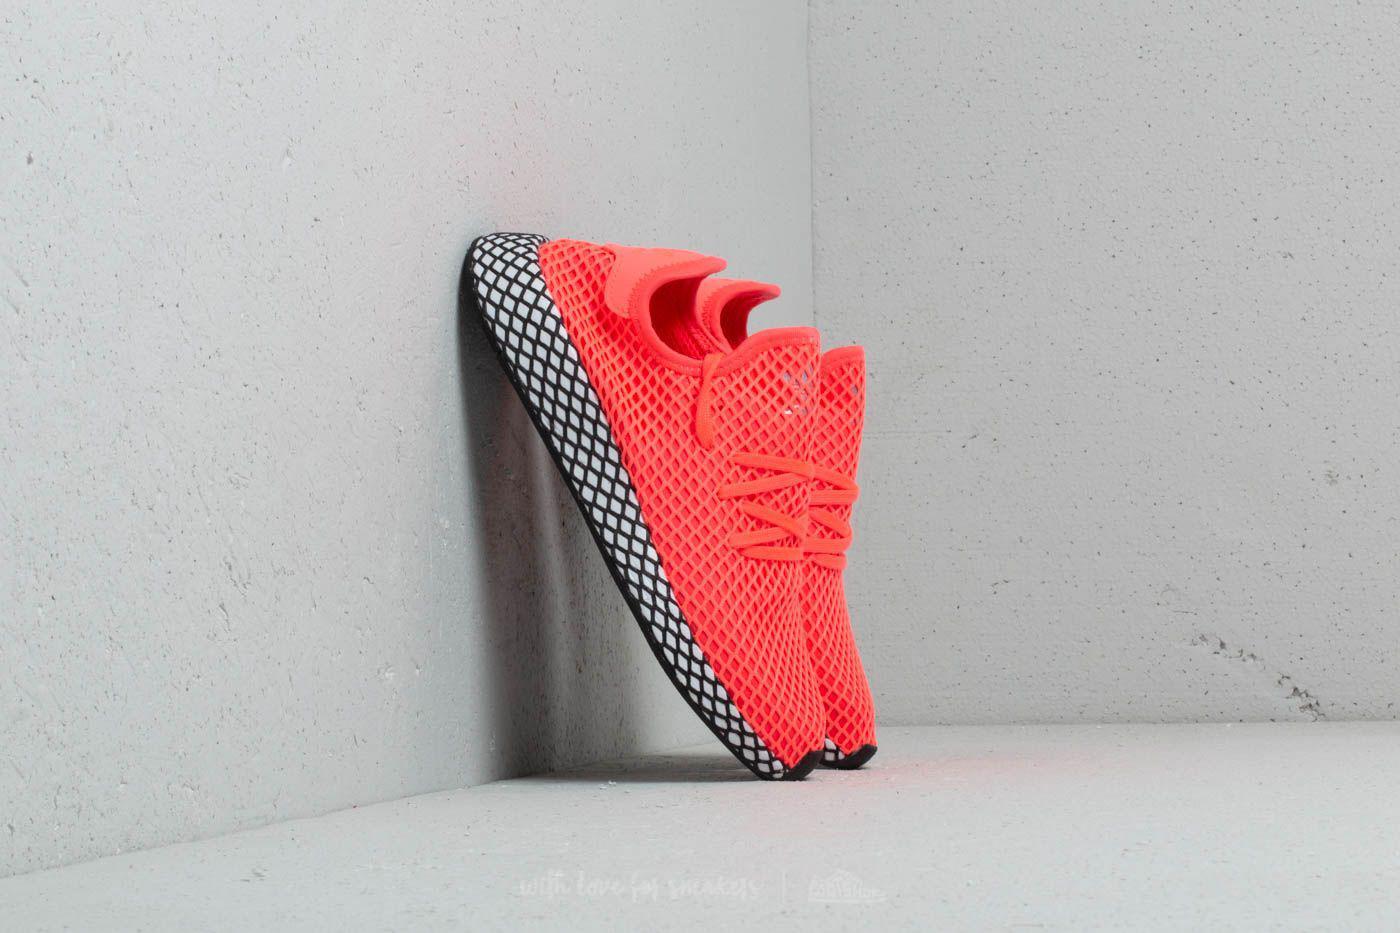 adidas Originals Rubber Adidas Deerupt